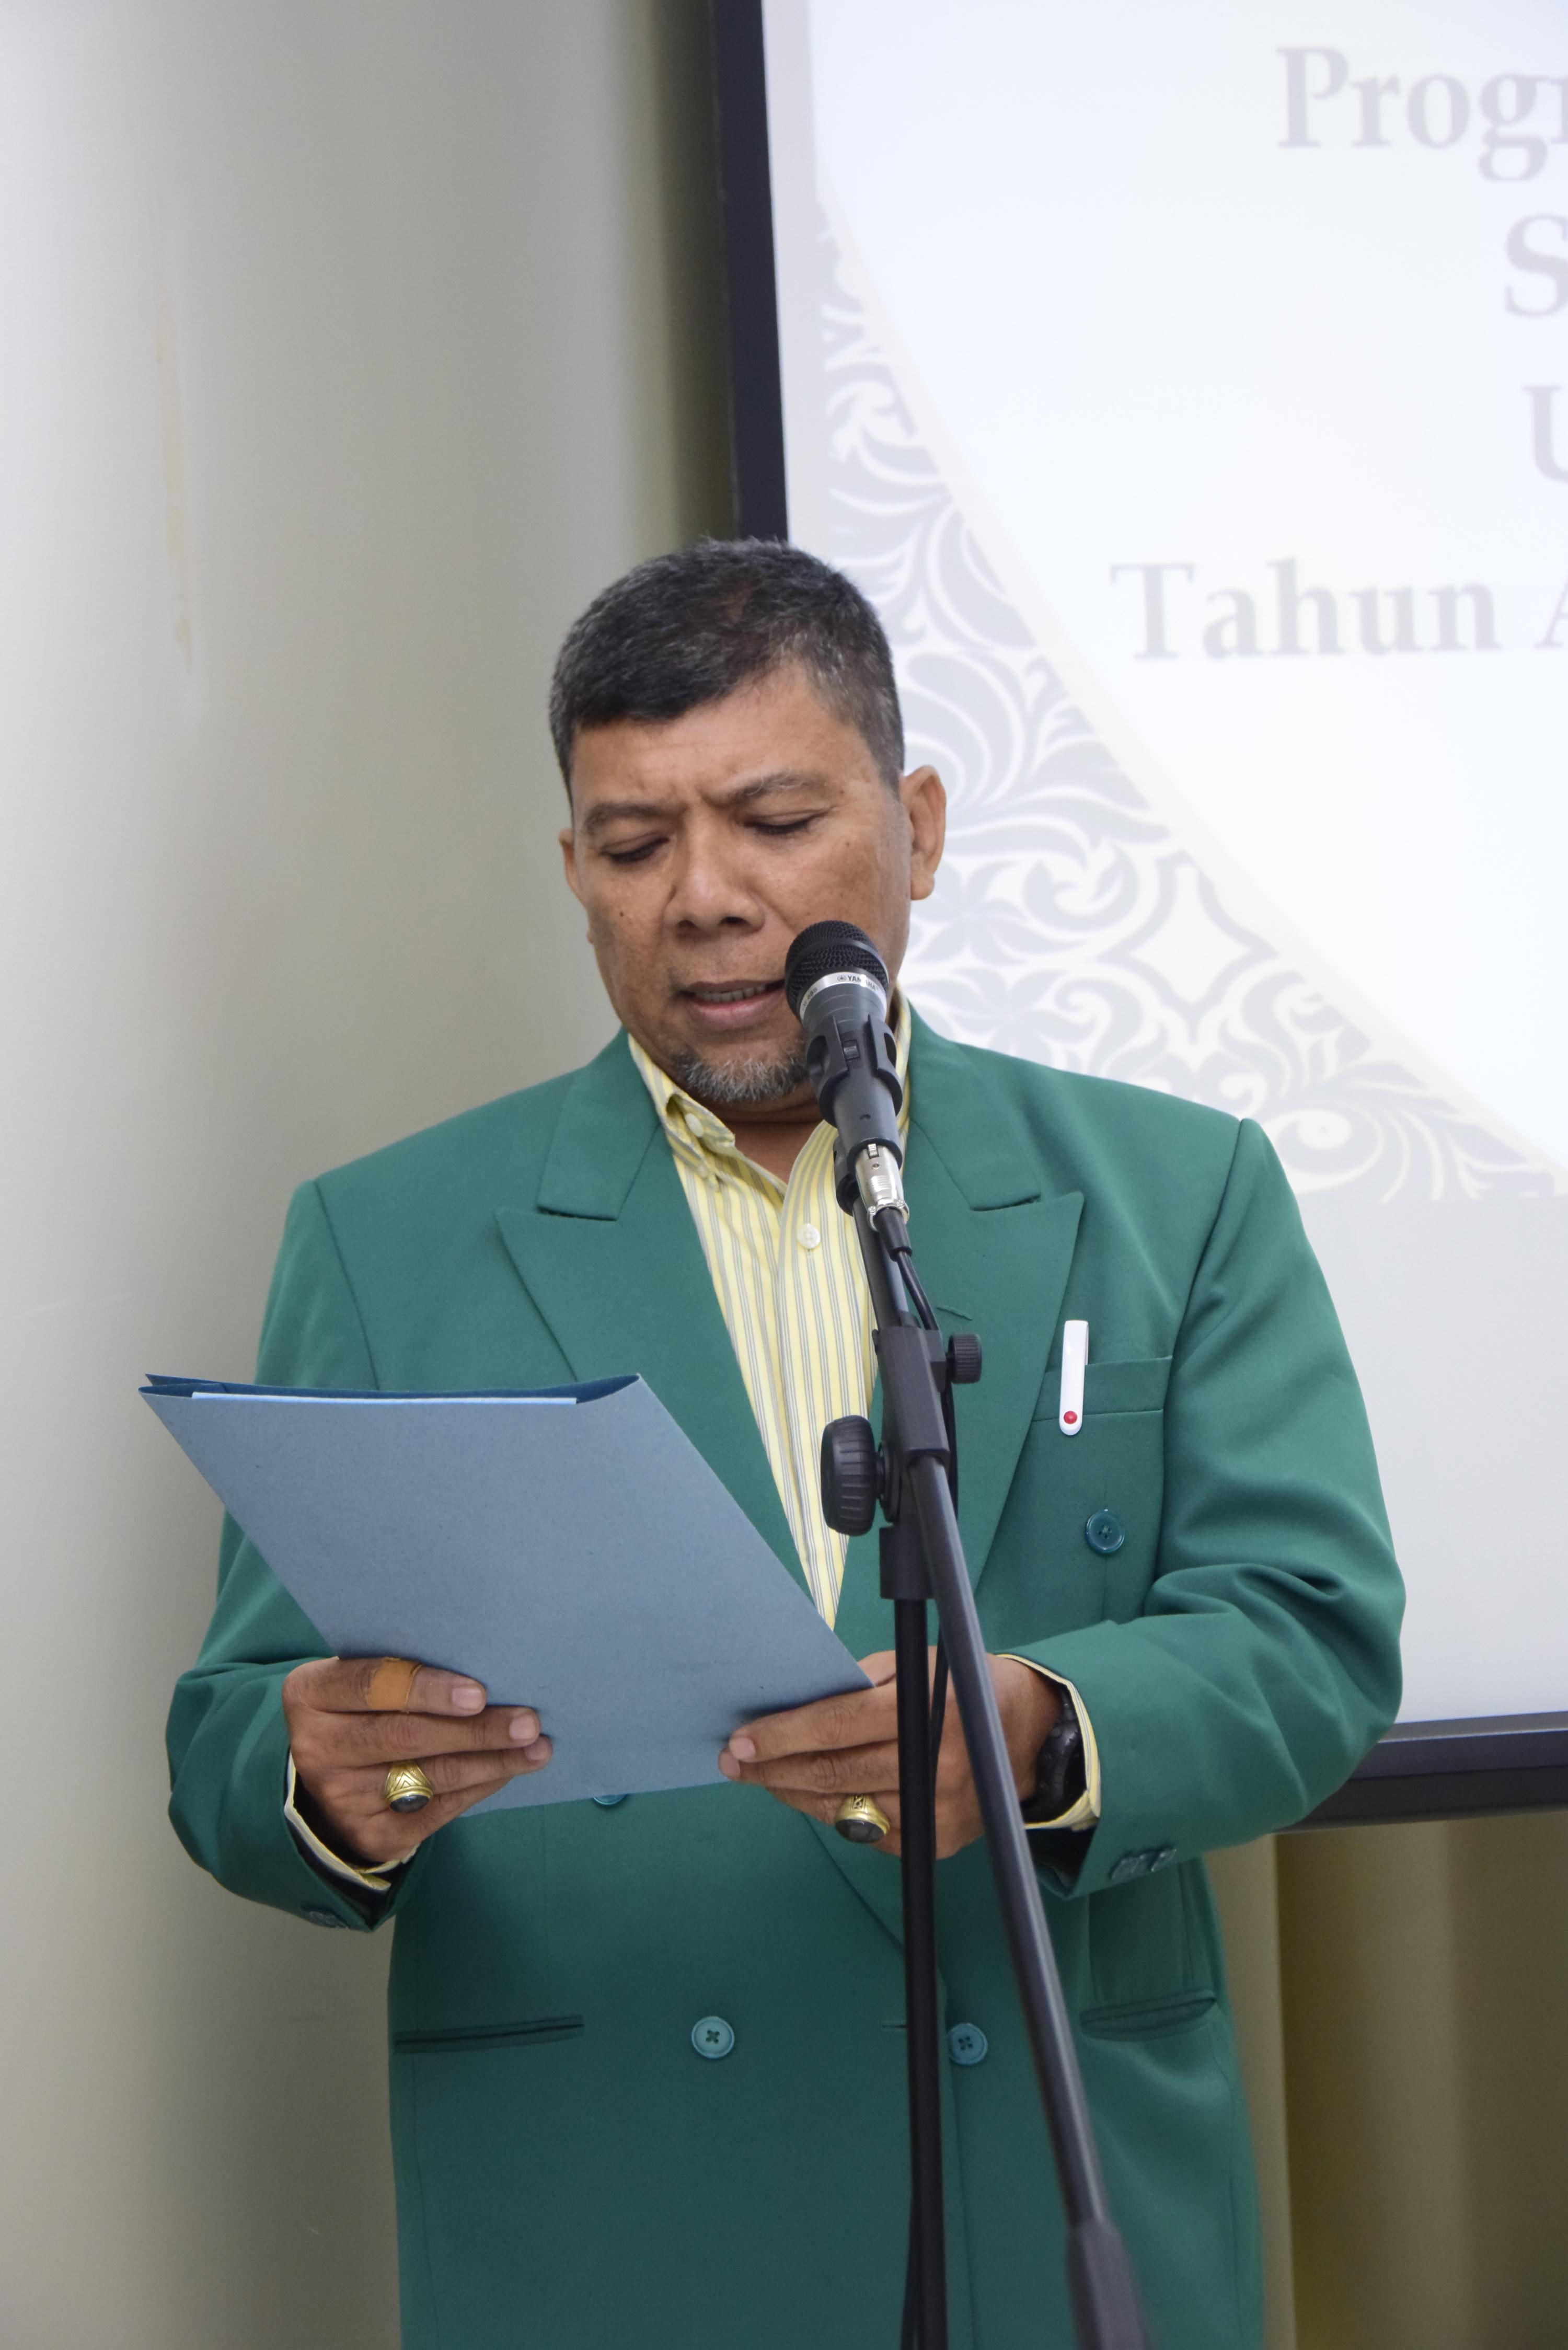 Master of Ceremony sedang memandu acara sidang doktoral Sdr. Muhammad Habib di Menara UNAS Ragunan, di Jakarta (21/3).